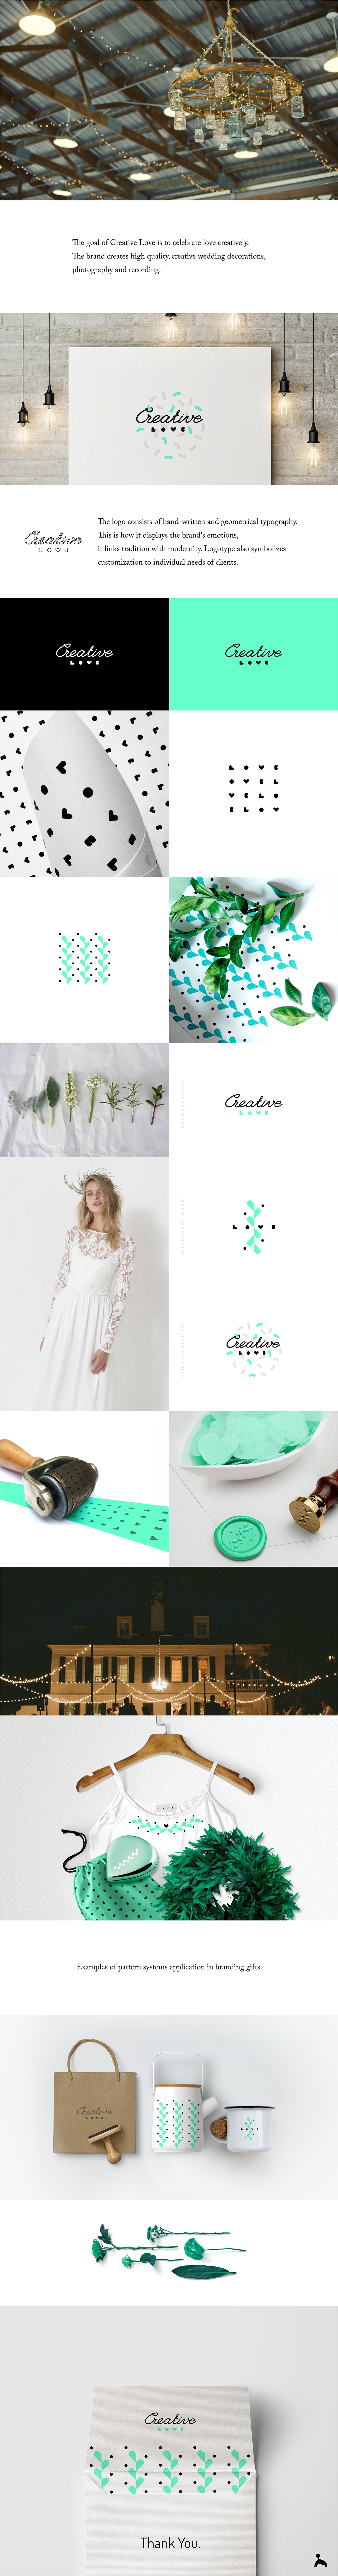 Creative Love * Wedding Decorations on Behance